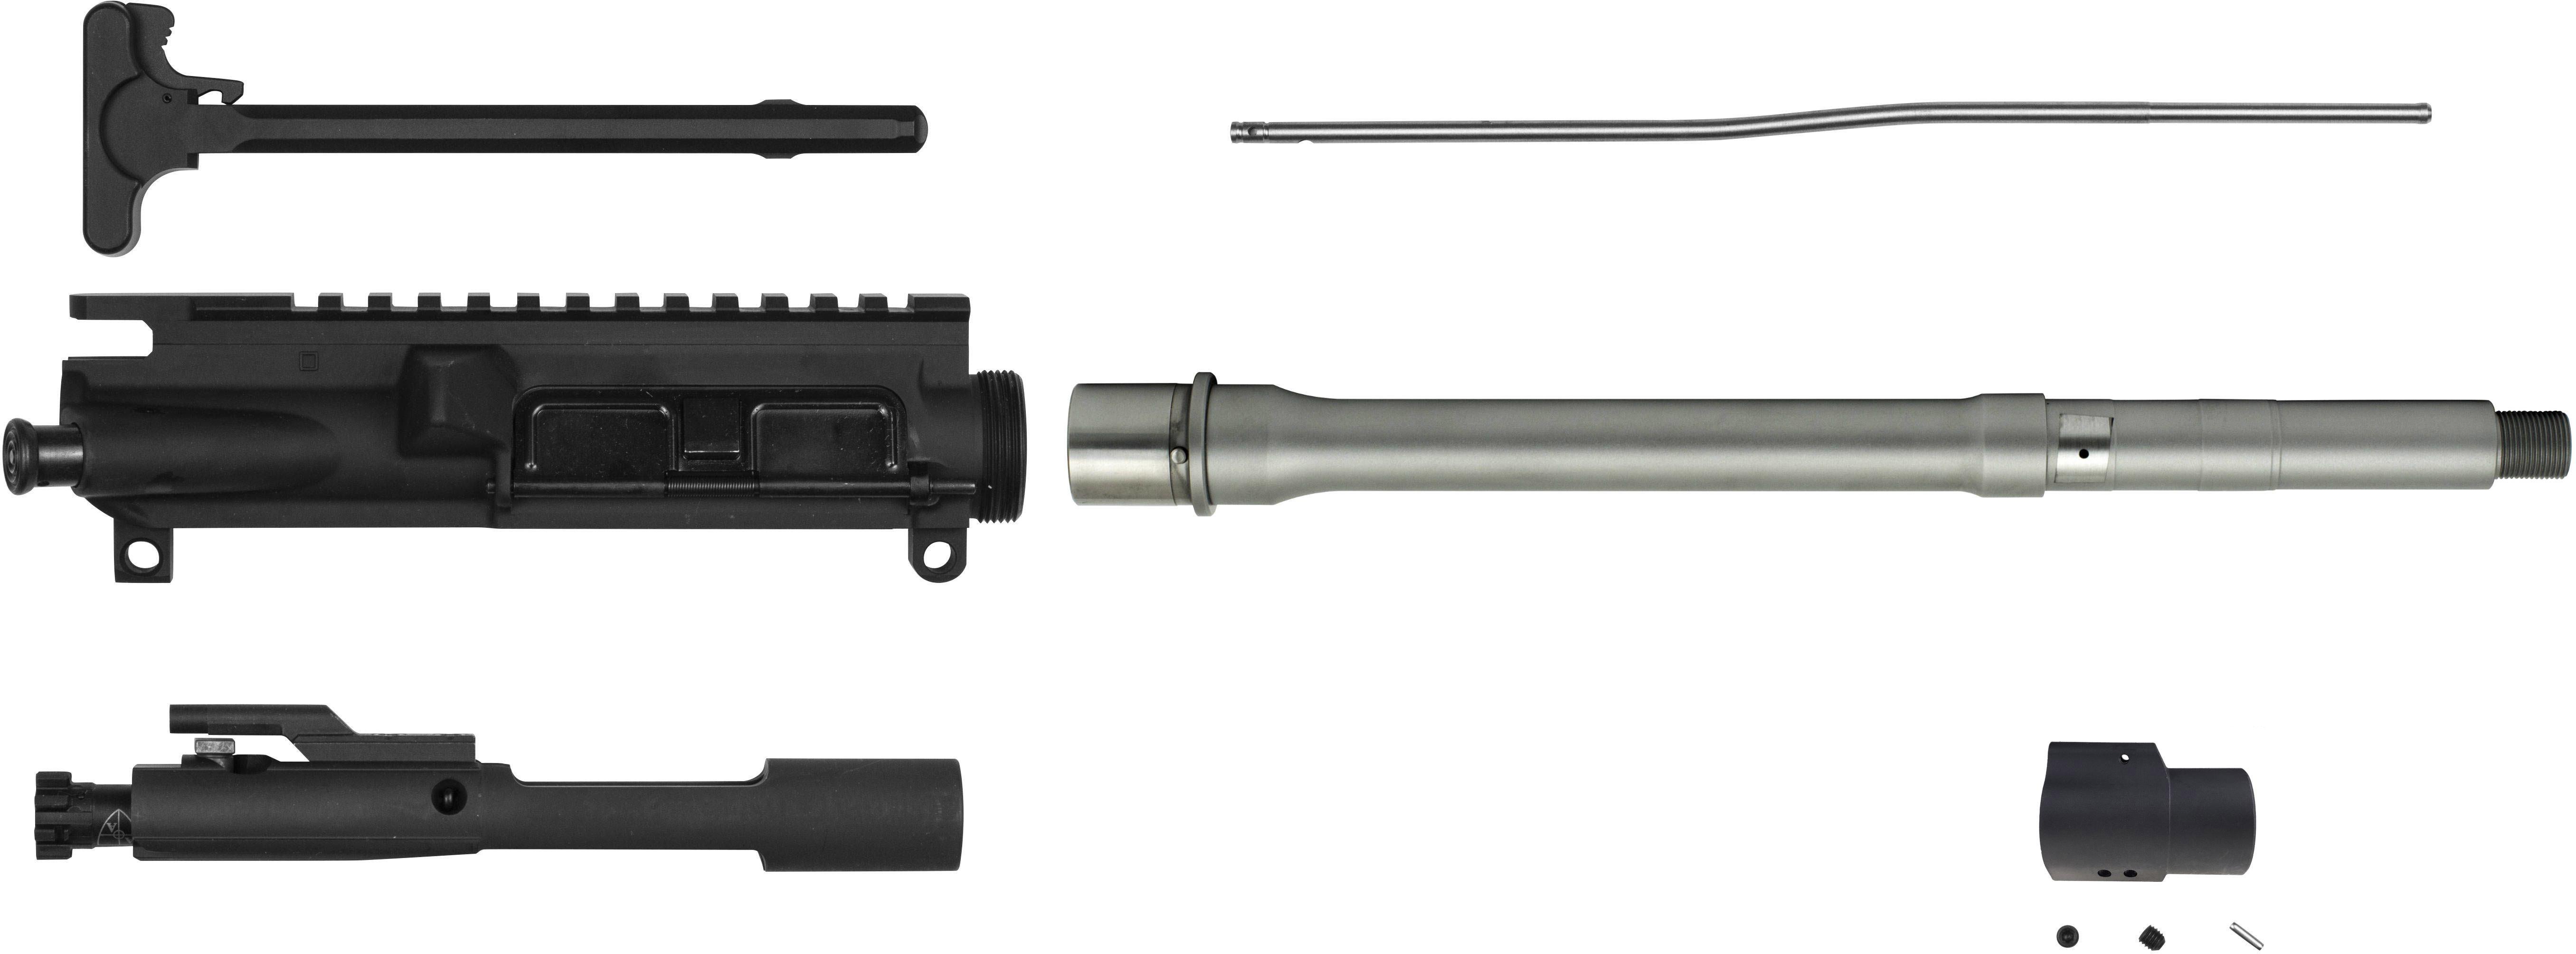 Alexander Arms Ar15 Stripped Pistol Upper W Free S H